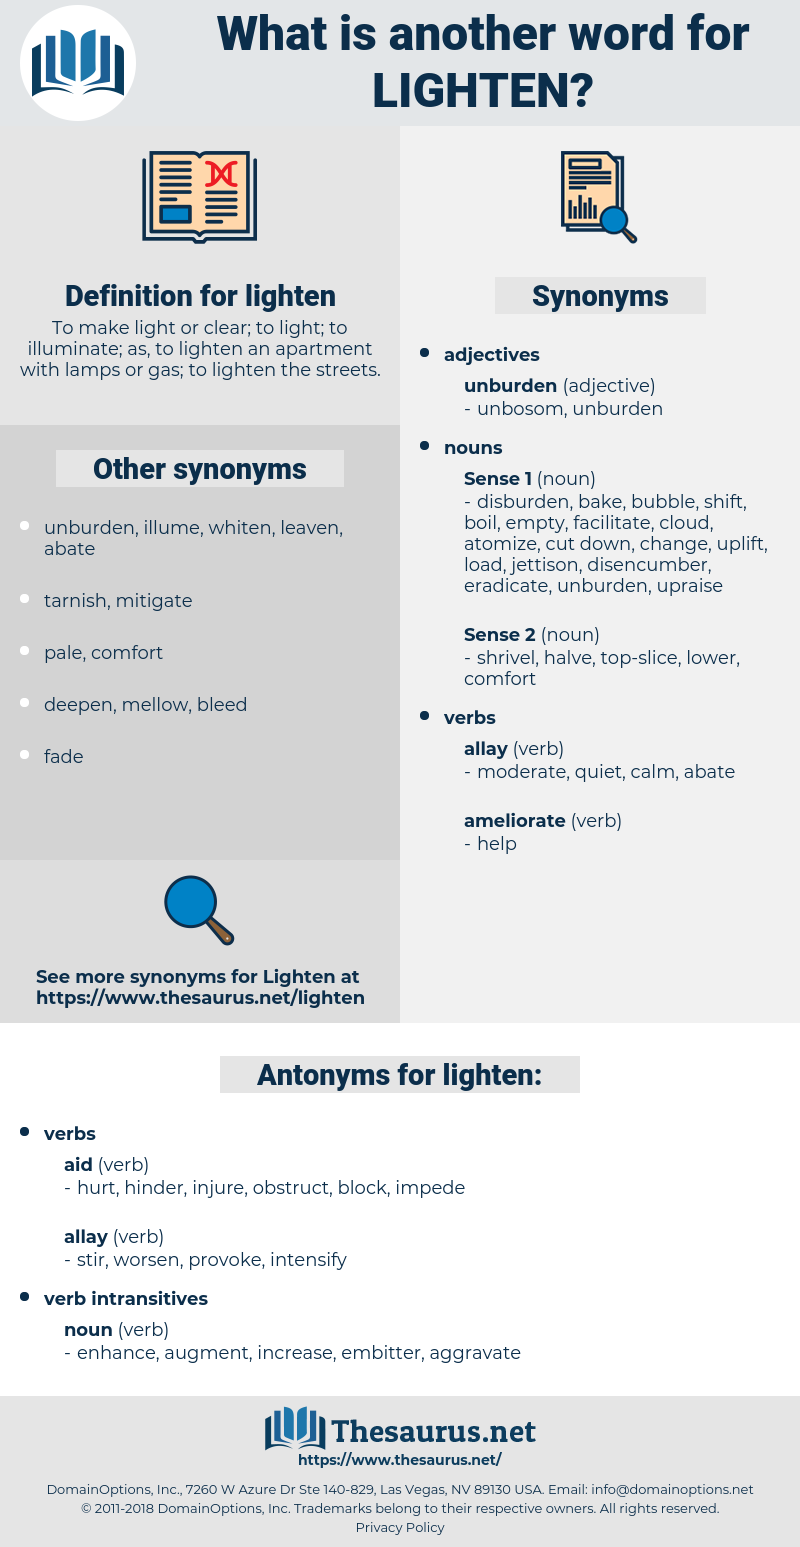 lighten, synonym lighten, another word for lighten, words like lighten, thesaurus lighten